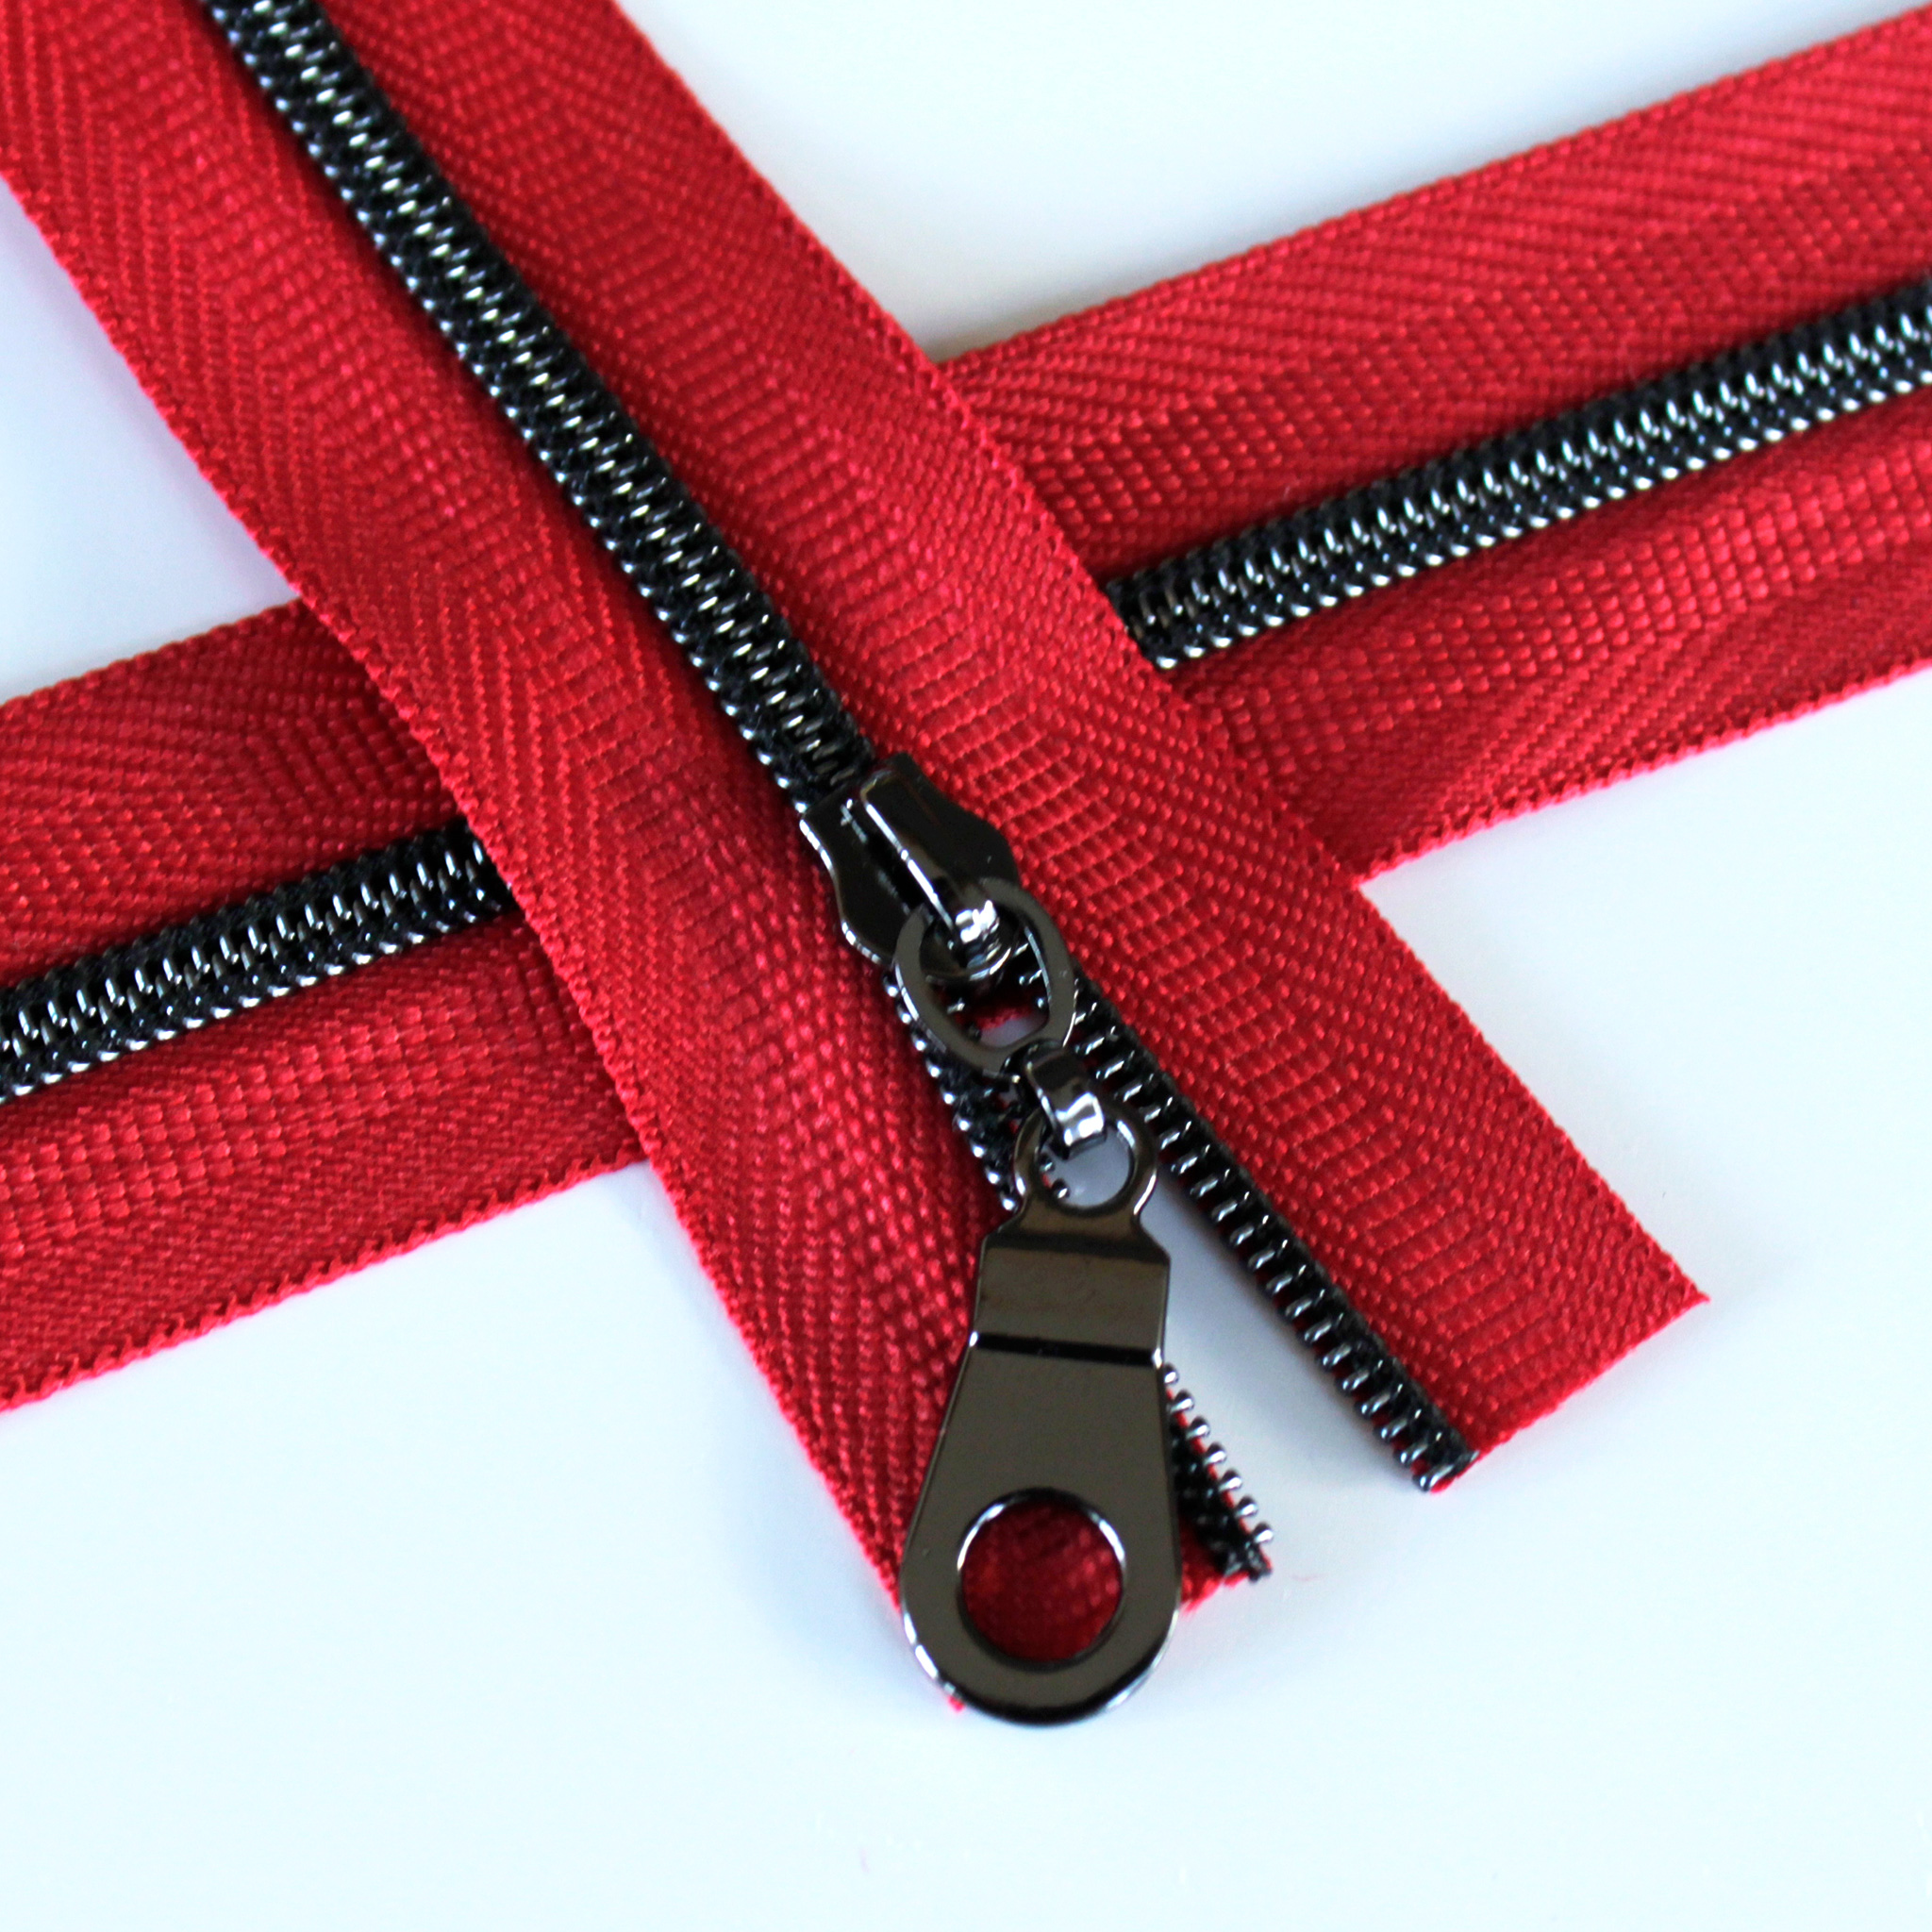 3-Nylon-Coil-Zipper-red-with-gunmetal-teeth